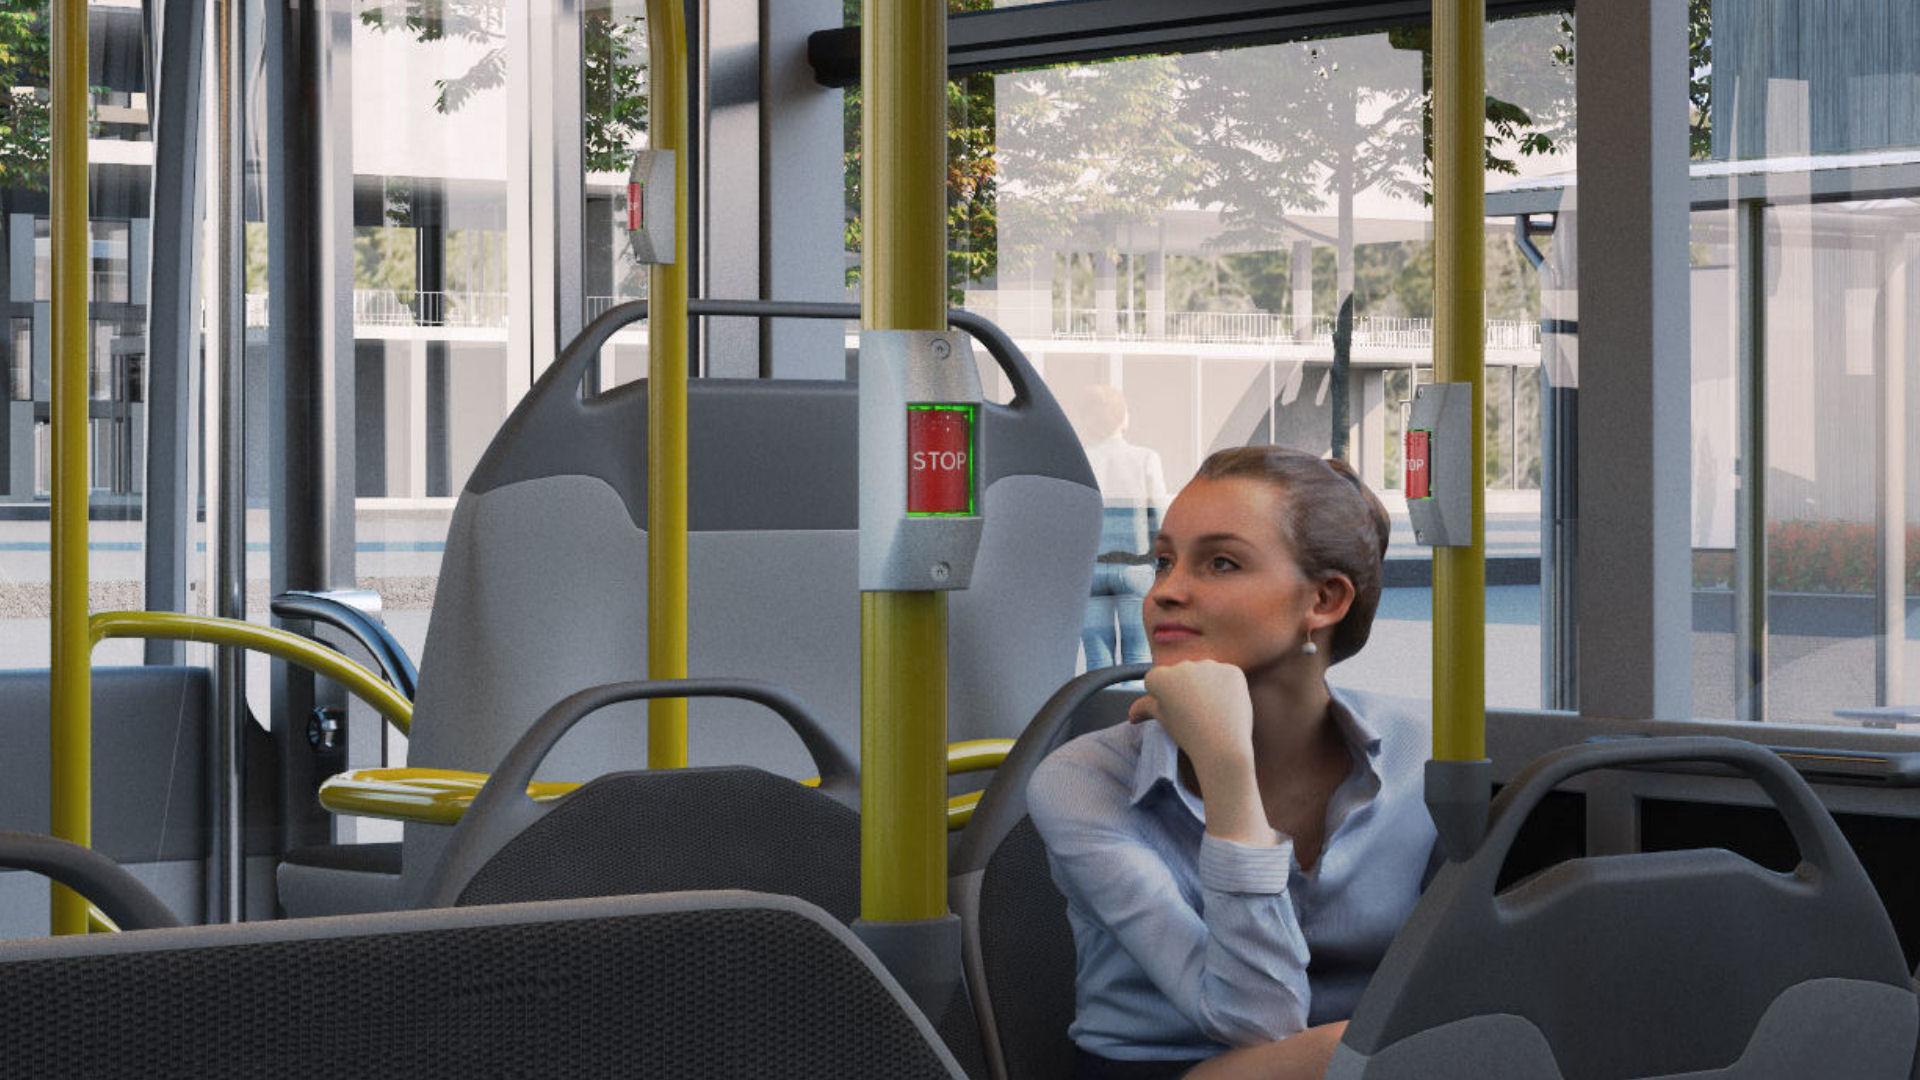 HSTB bus